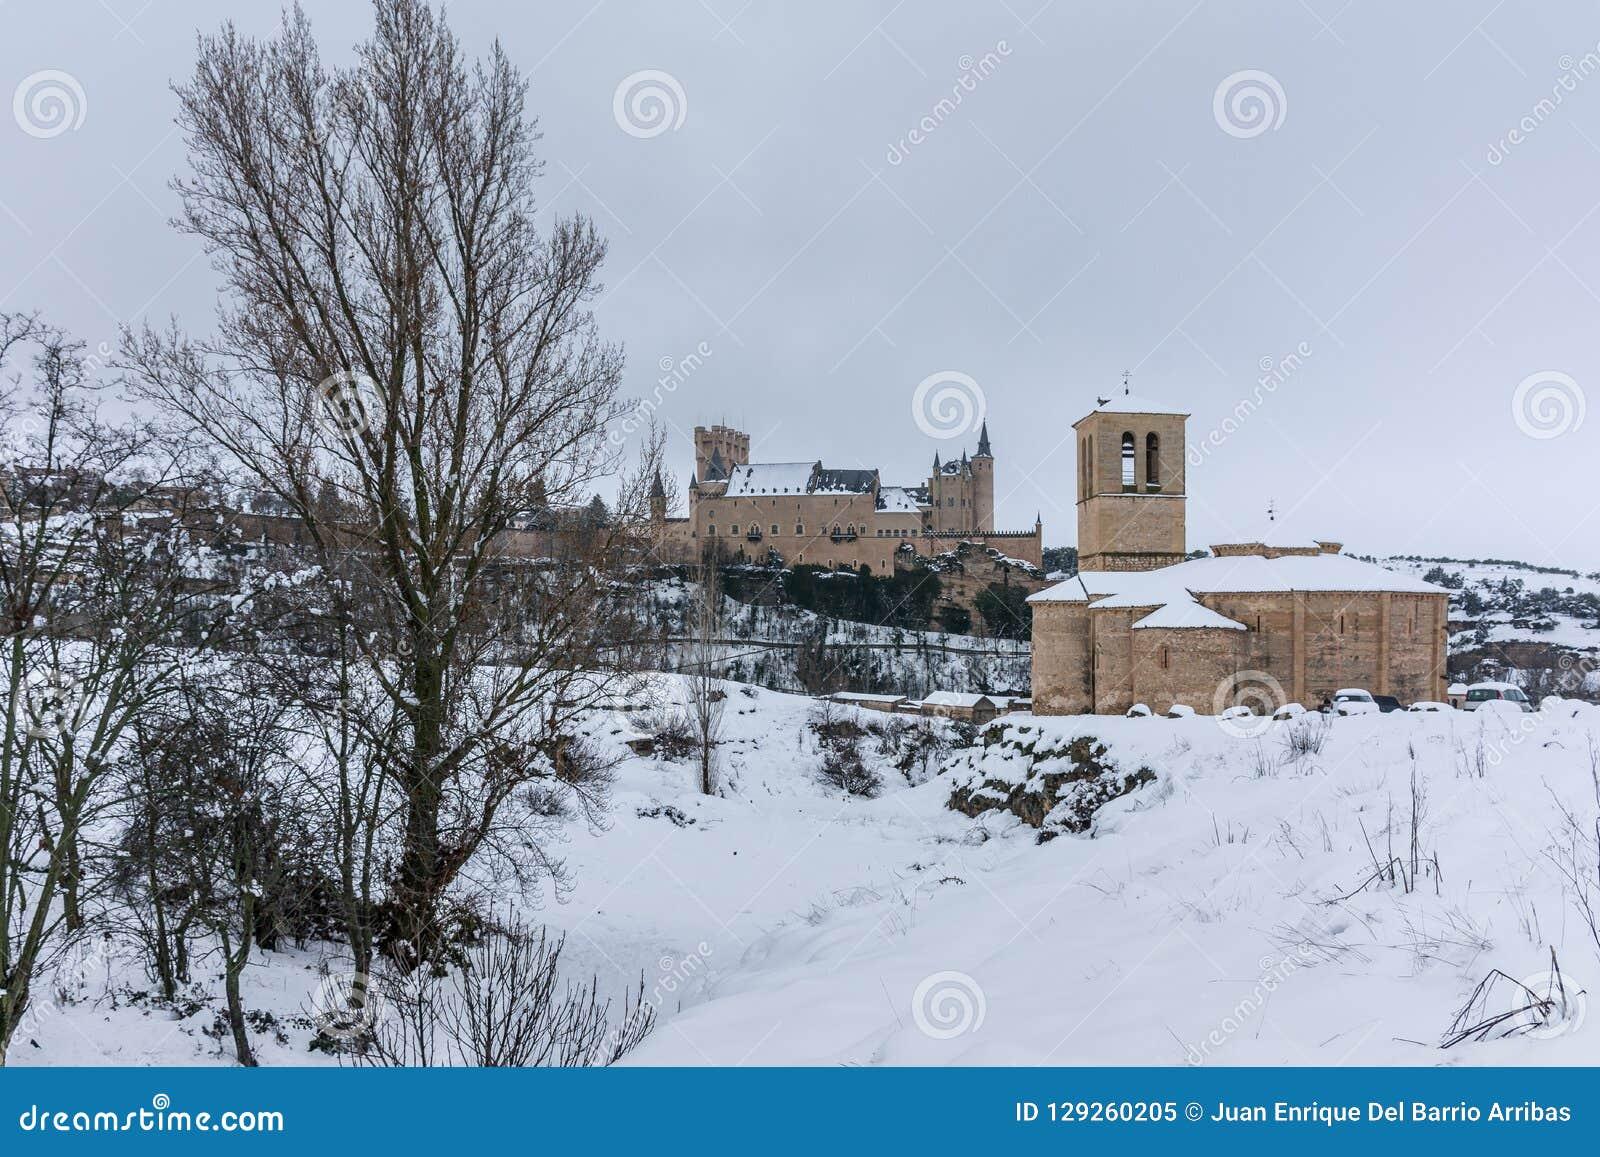 Templar Church Of Veracruz And Alcazar Of Segovia In Spain